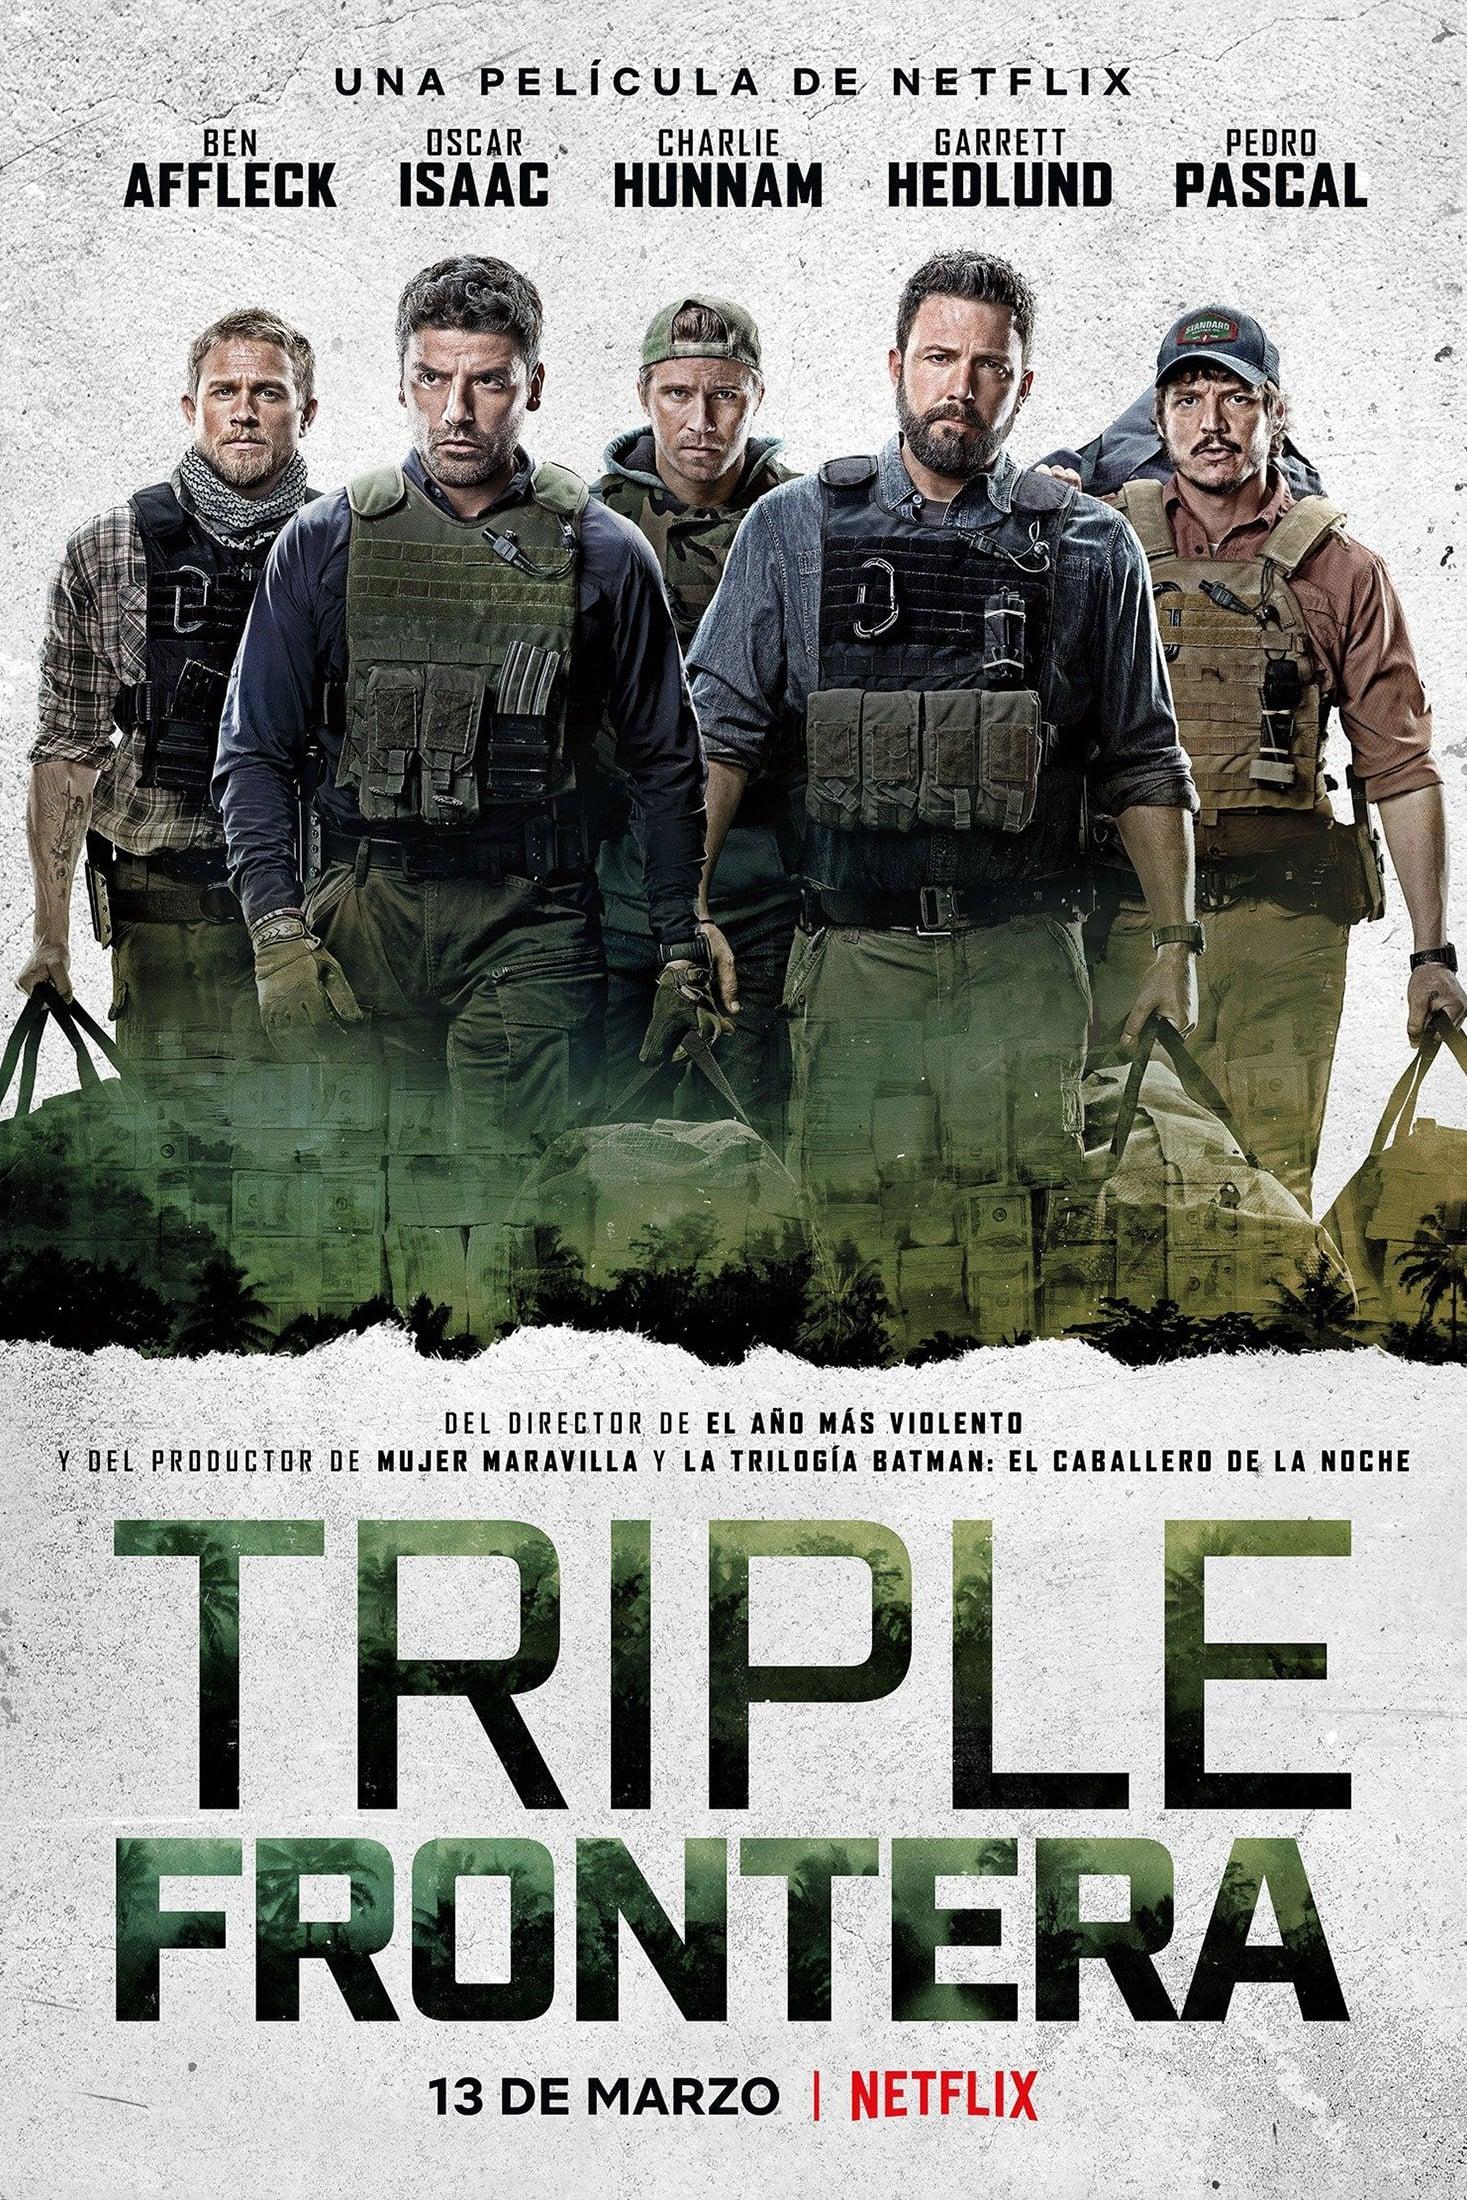 Imagen Triple frontera